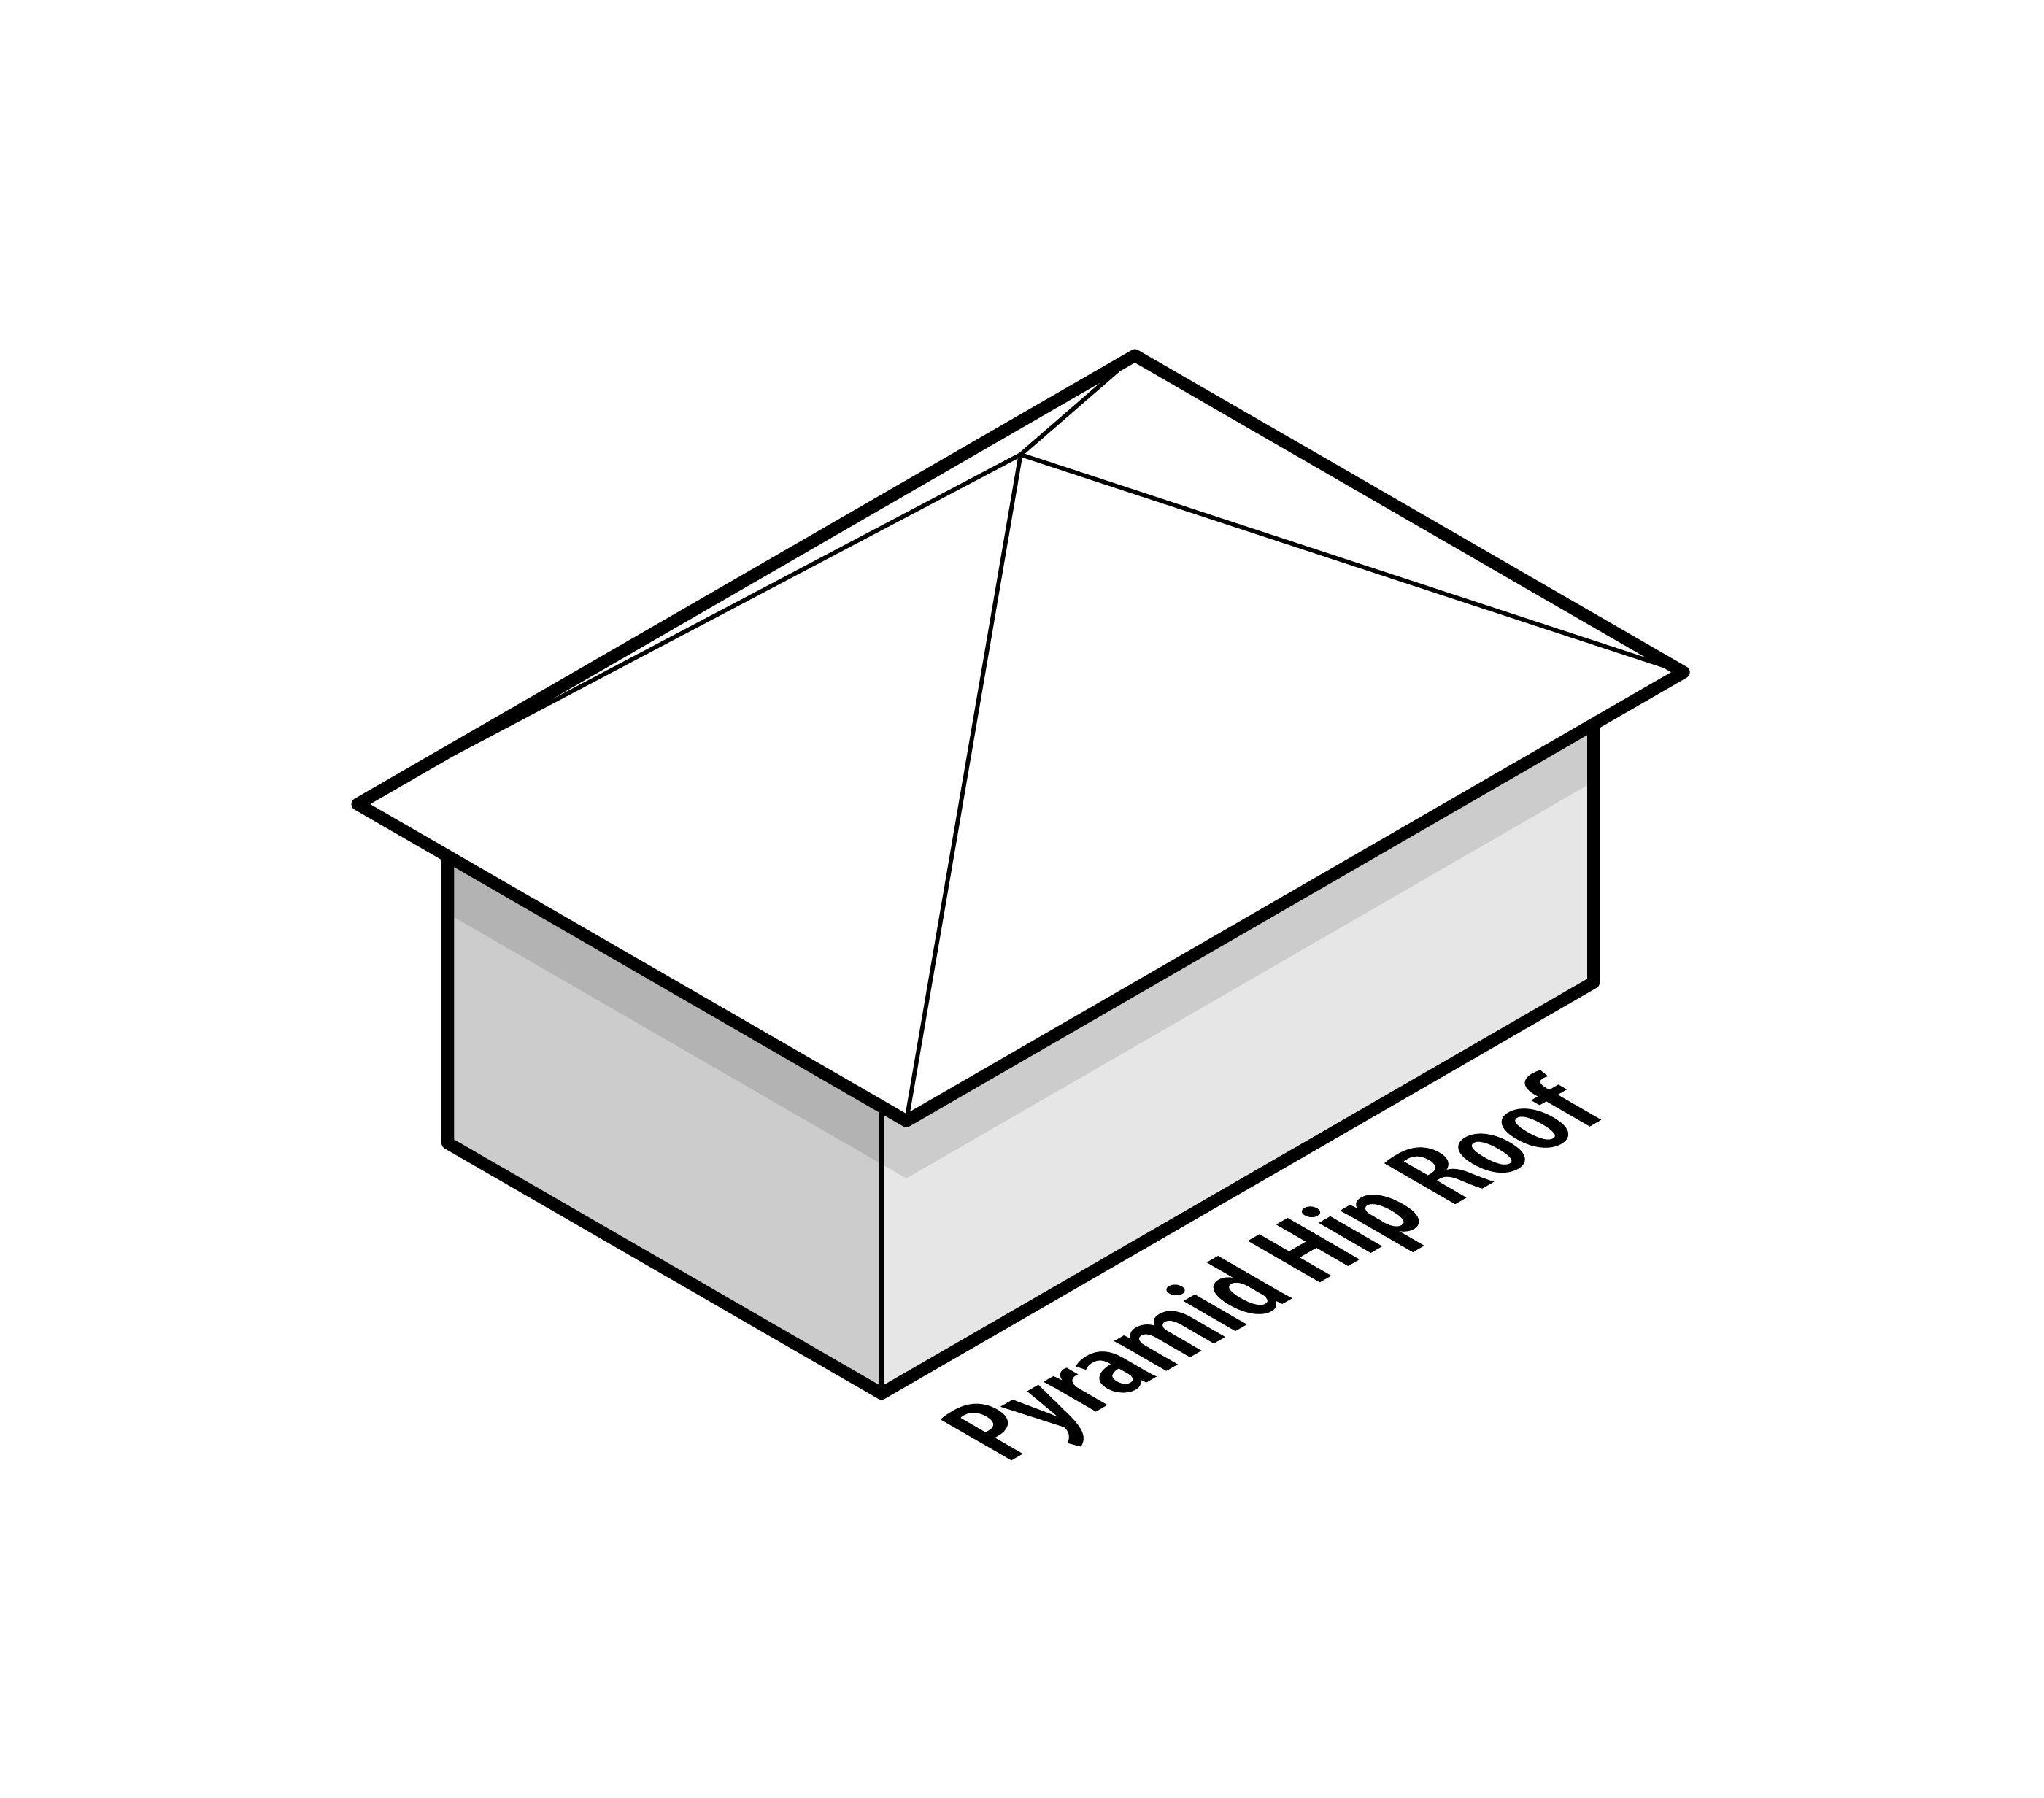 Pyramid Hip Roof Design Hip Roof Design Roof Shapes Roof Design